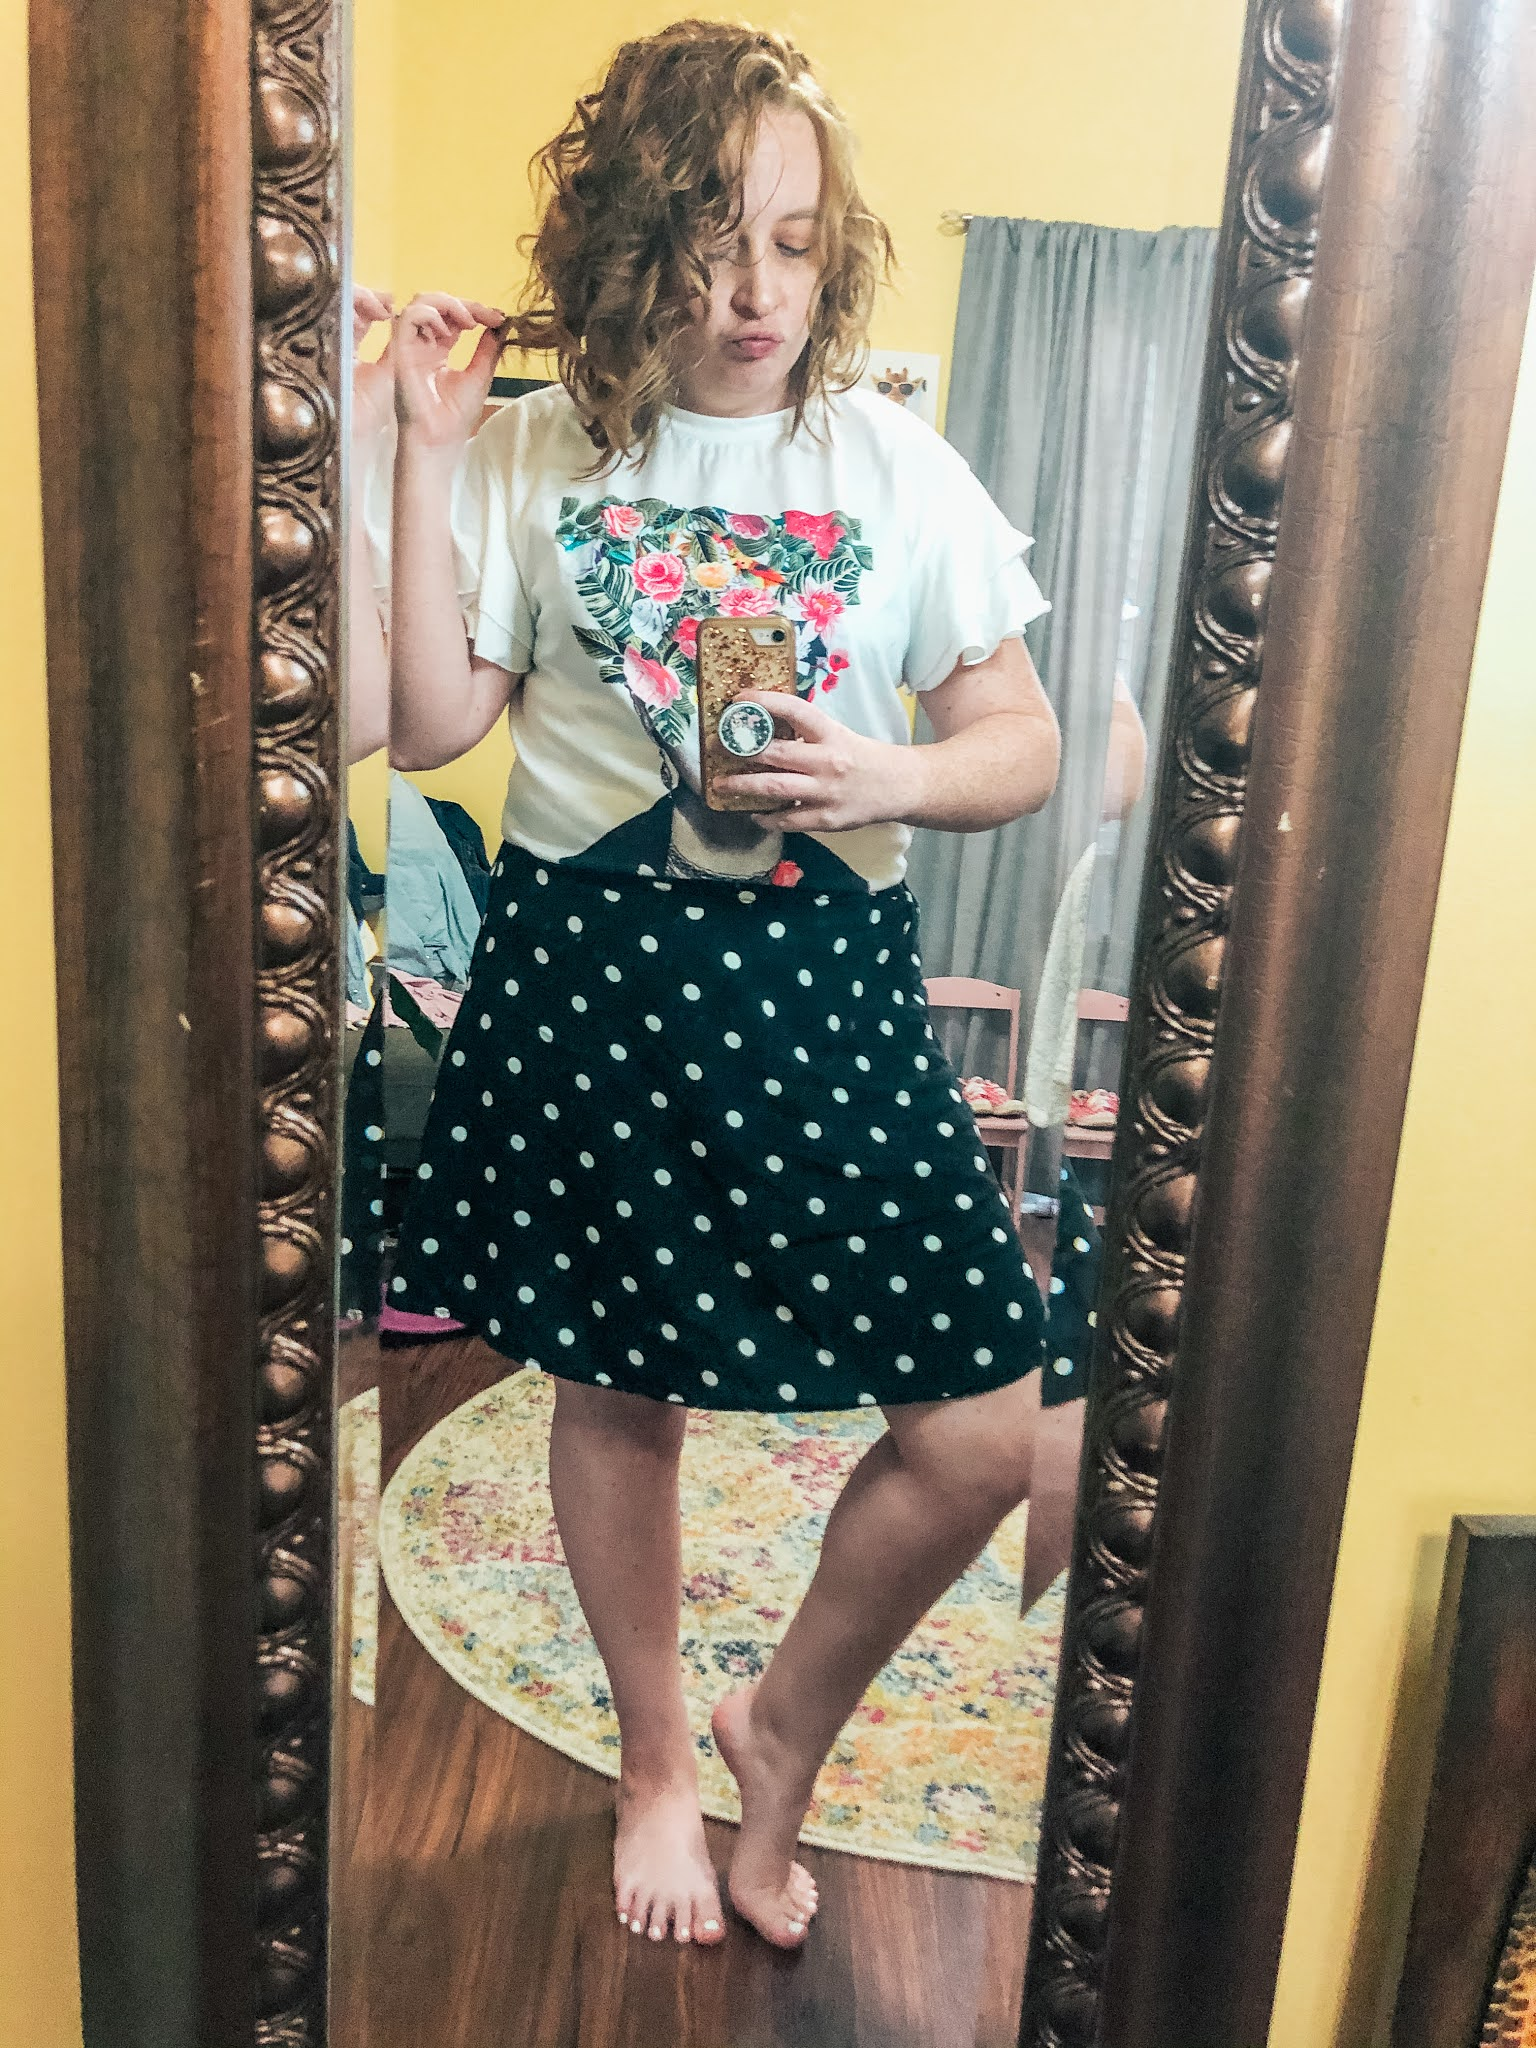 frida-kahlo-shirt-polka-dot-skirt